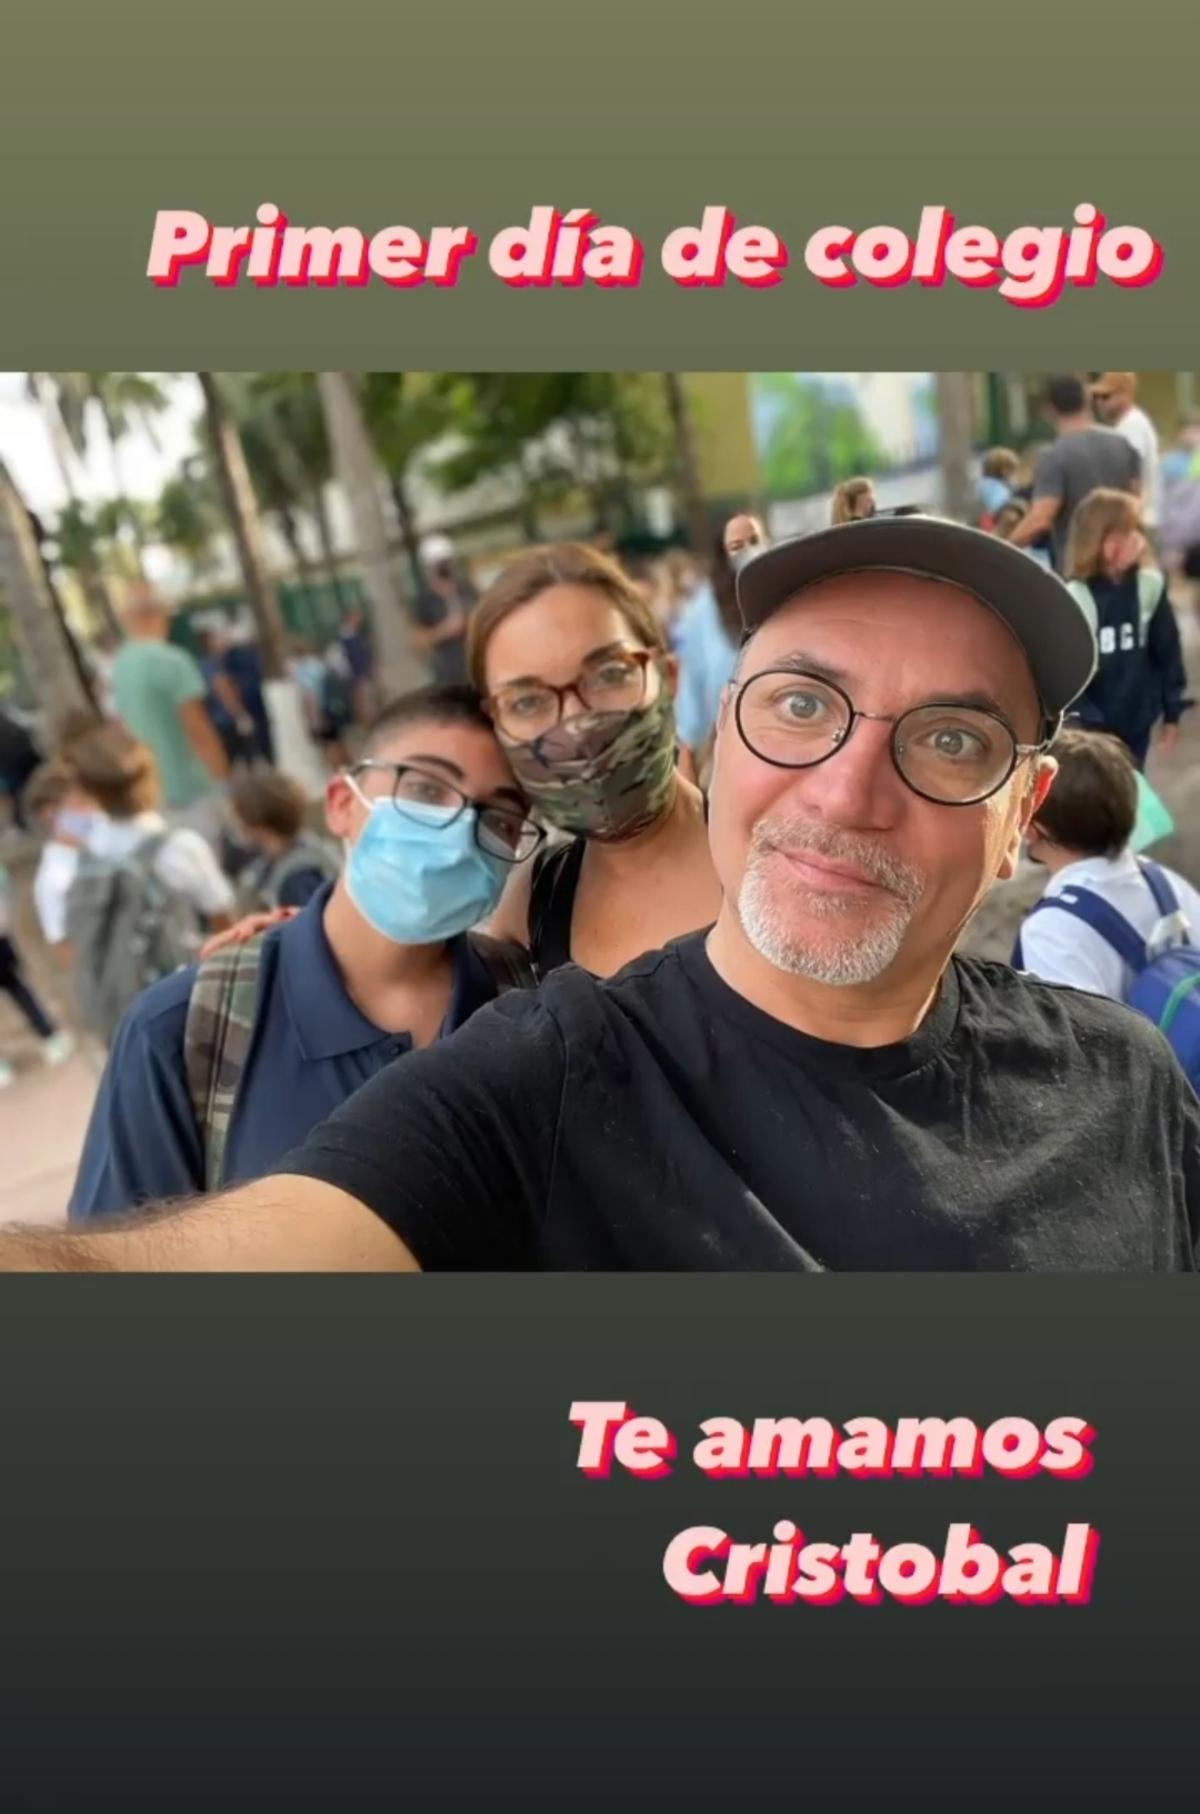 Luis Jara Miami